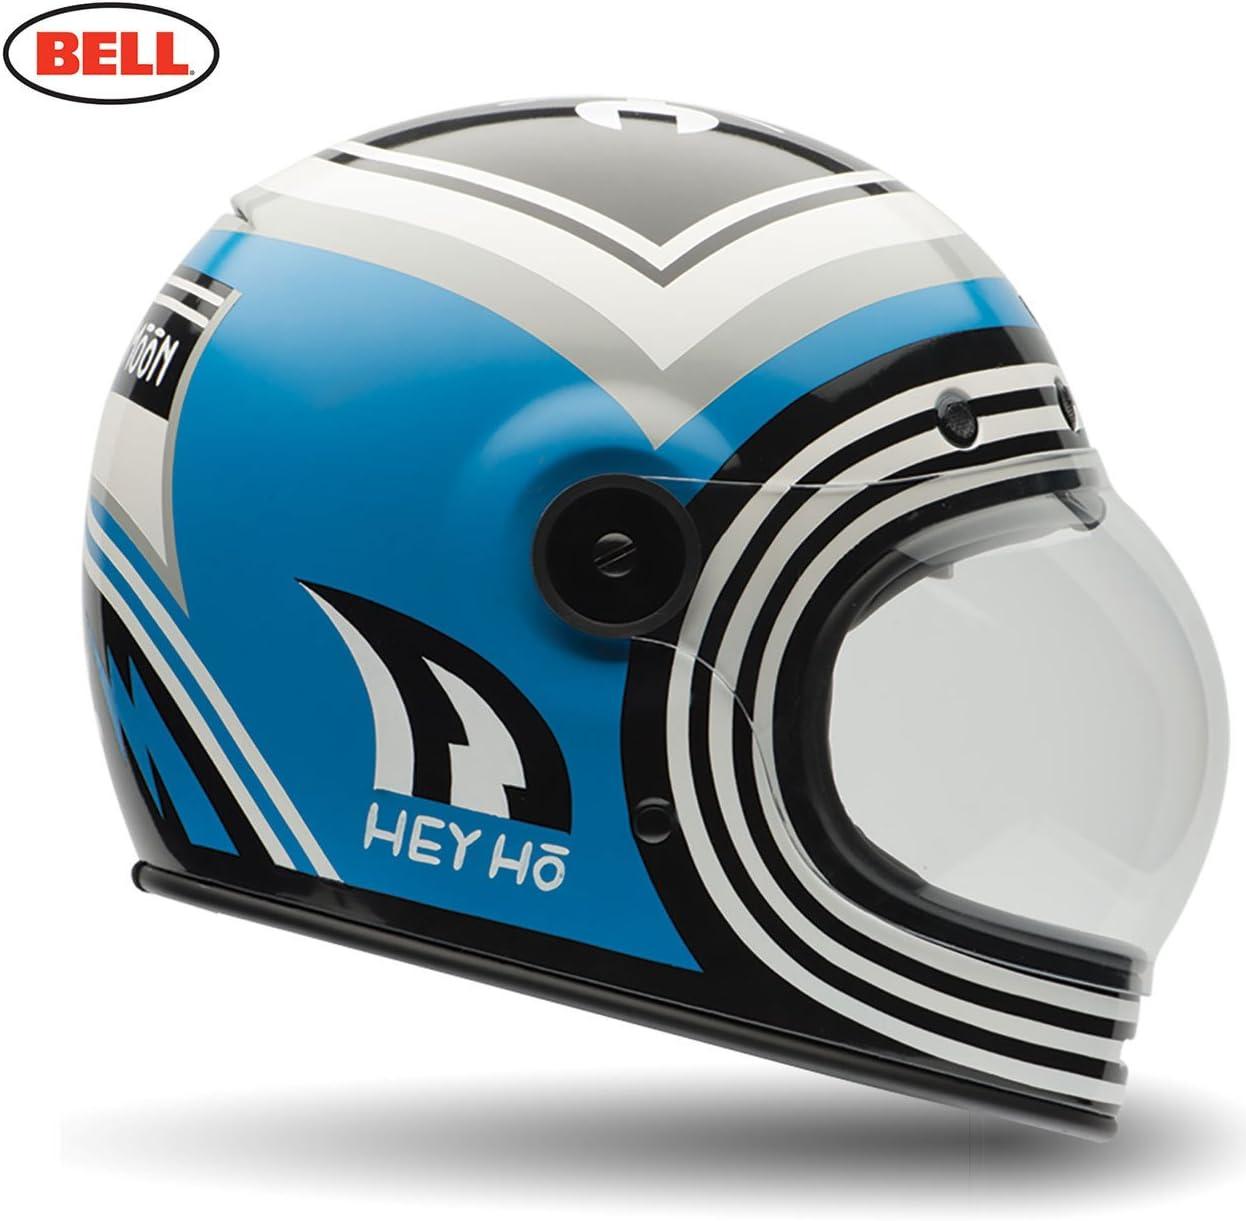 Bell Motorradhelme Street 2015 Bullitt Se Adult Helm Barn Fresh Hey Ho Small Auto